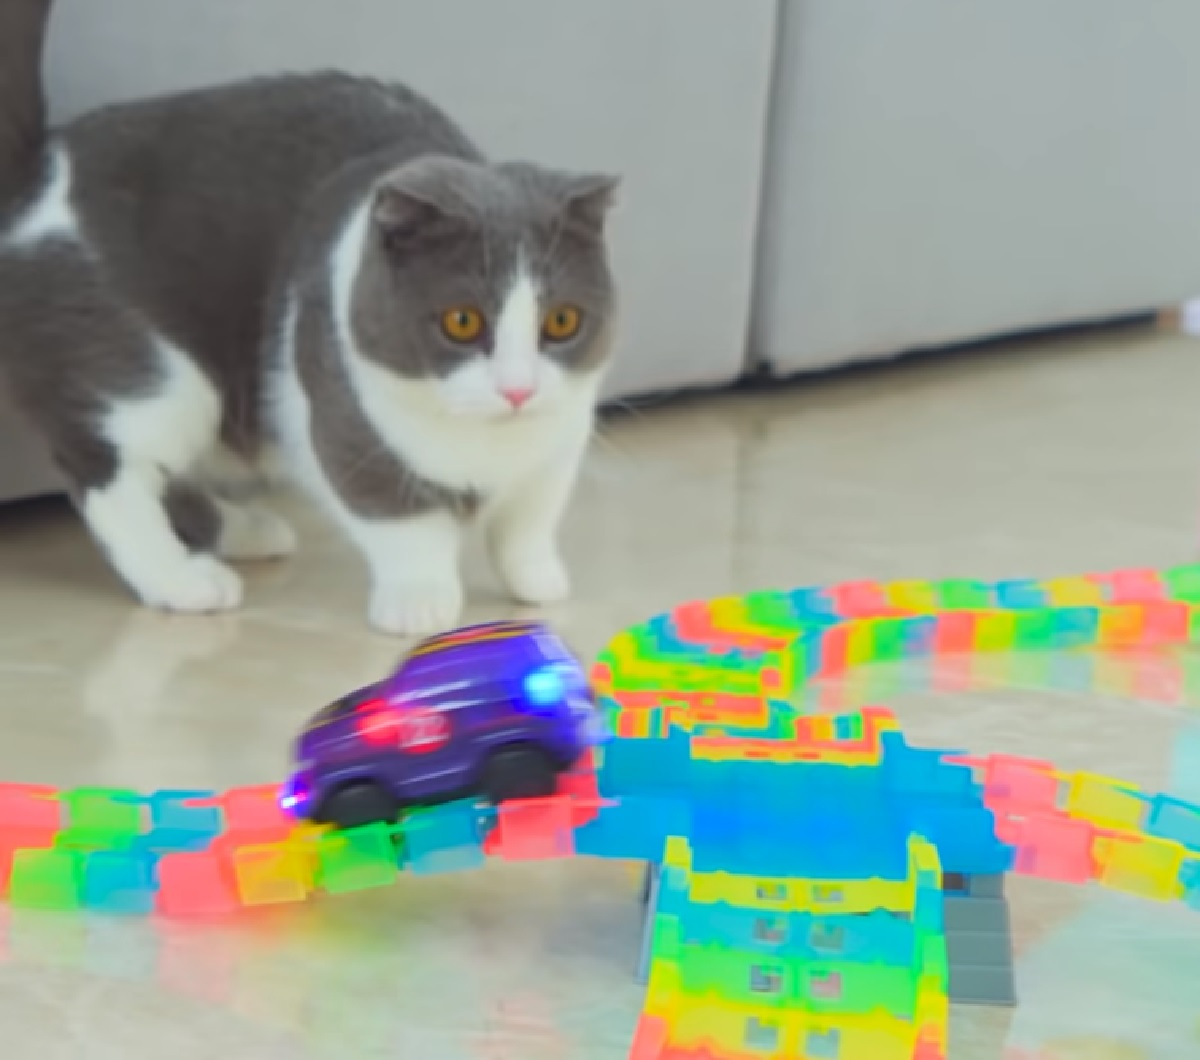 coco gattina osserva macchina